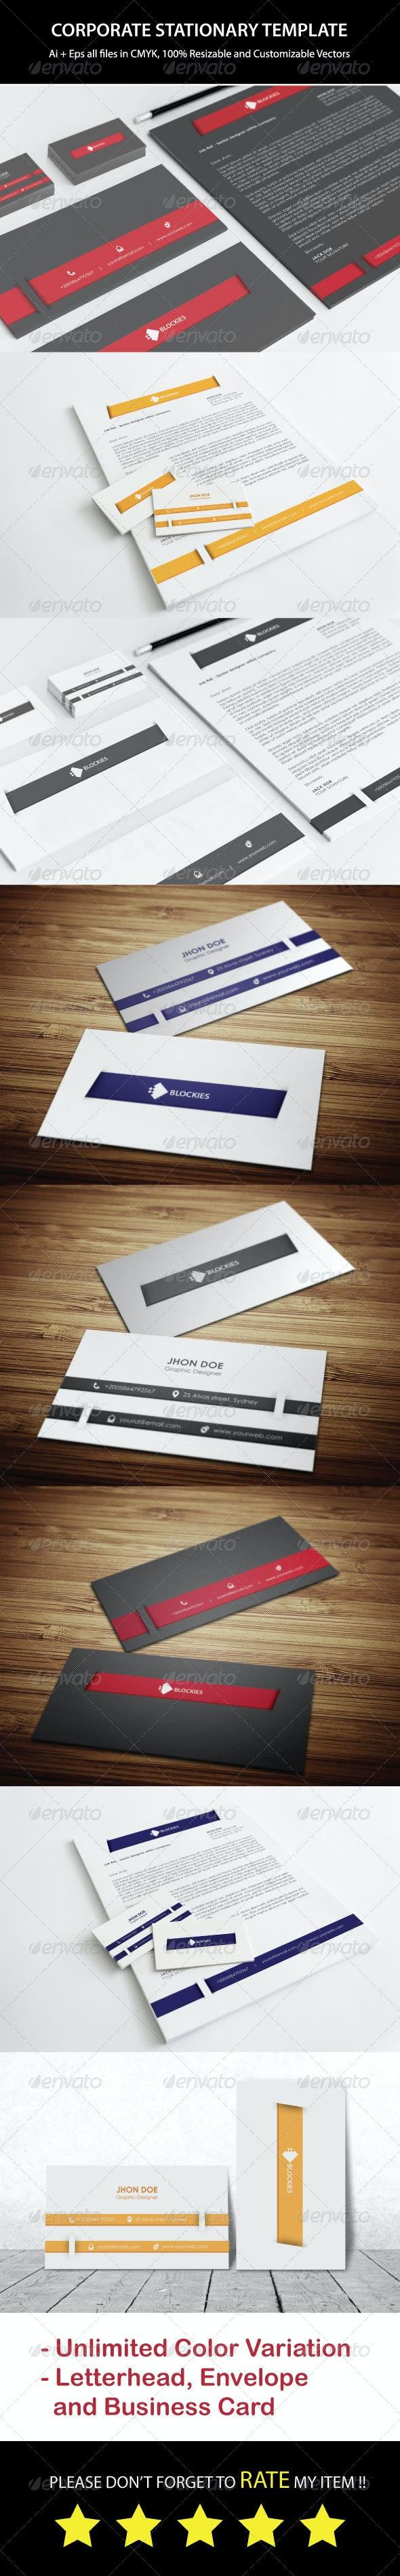 Corporate Stationery Template V.2 - Stationery Print Templates